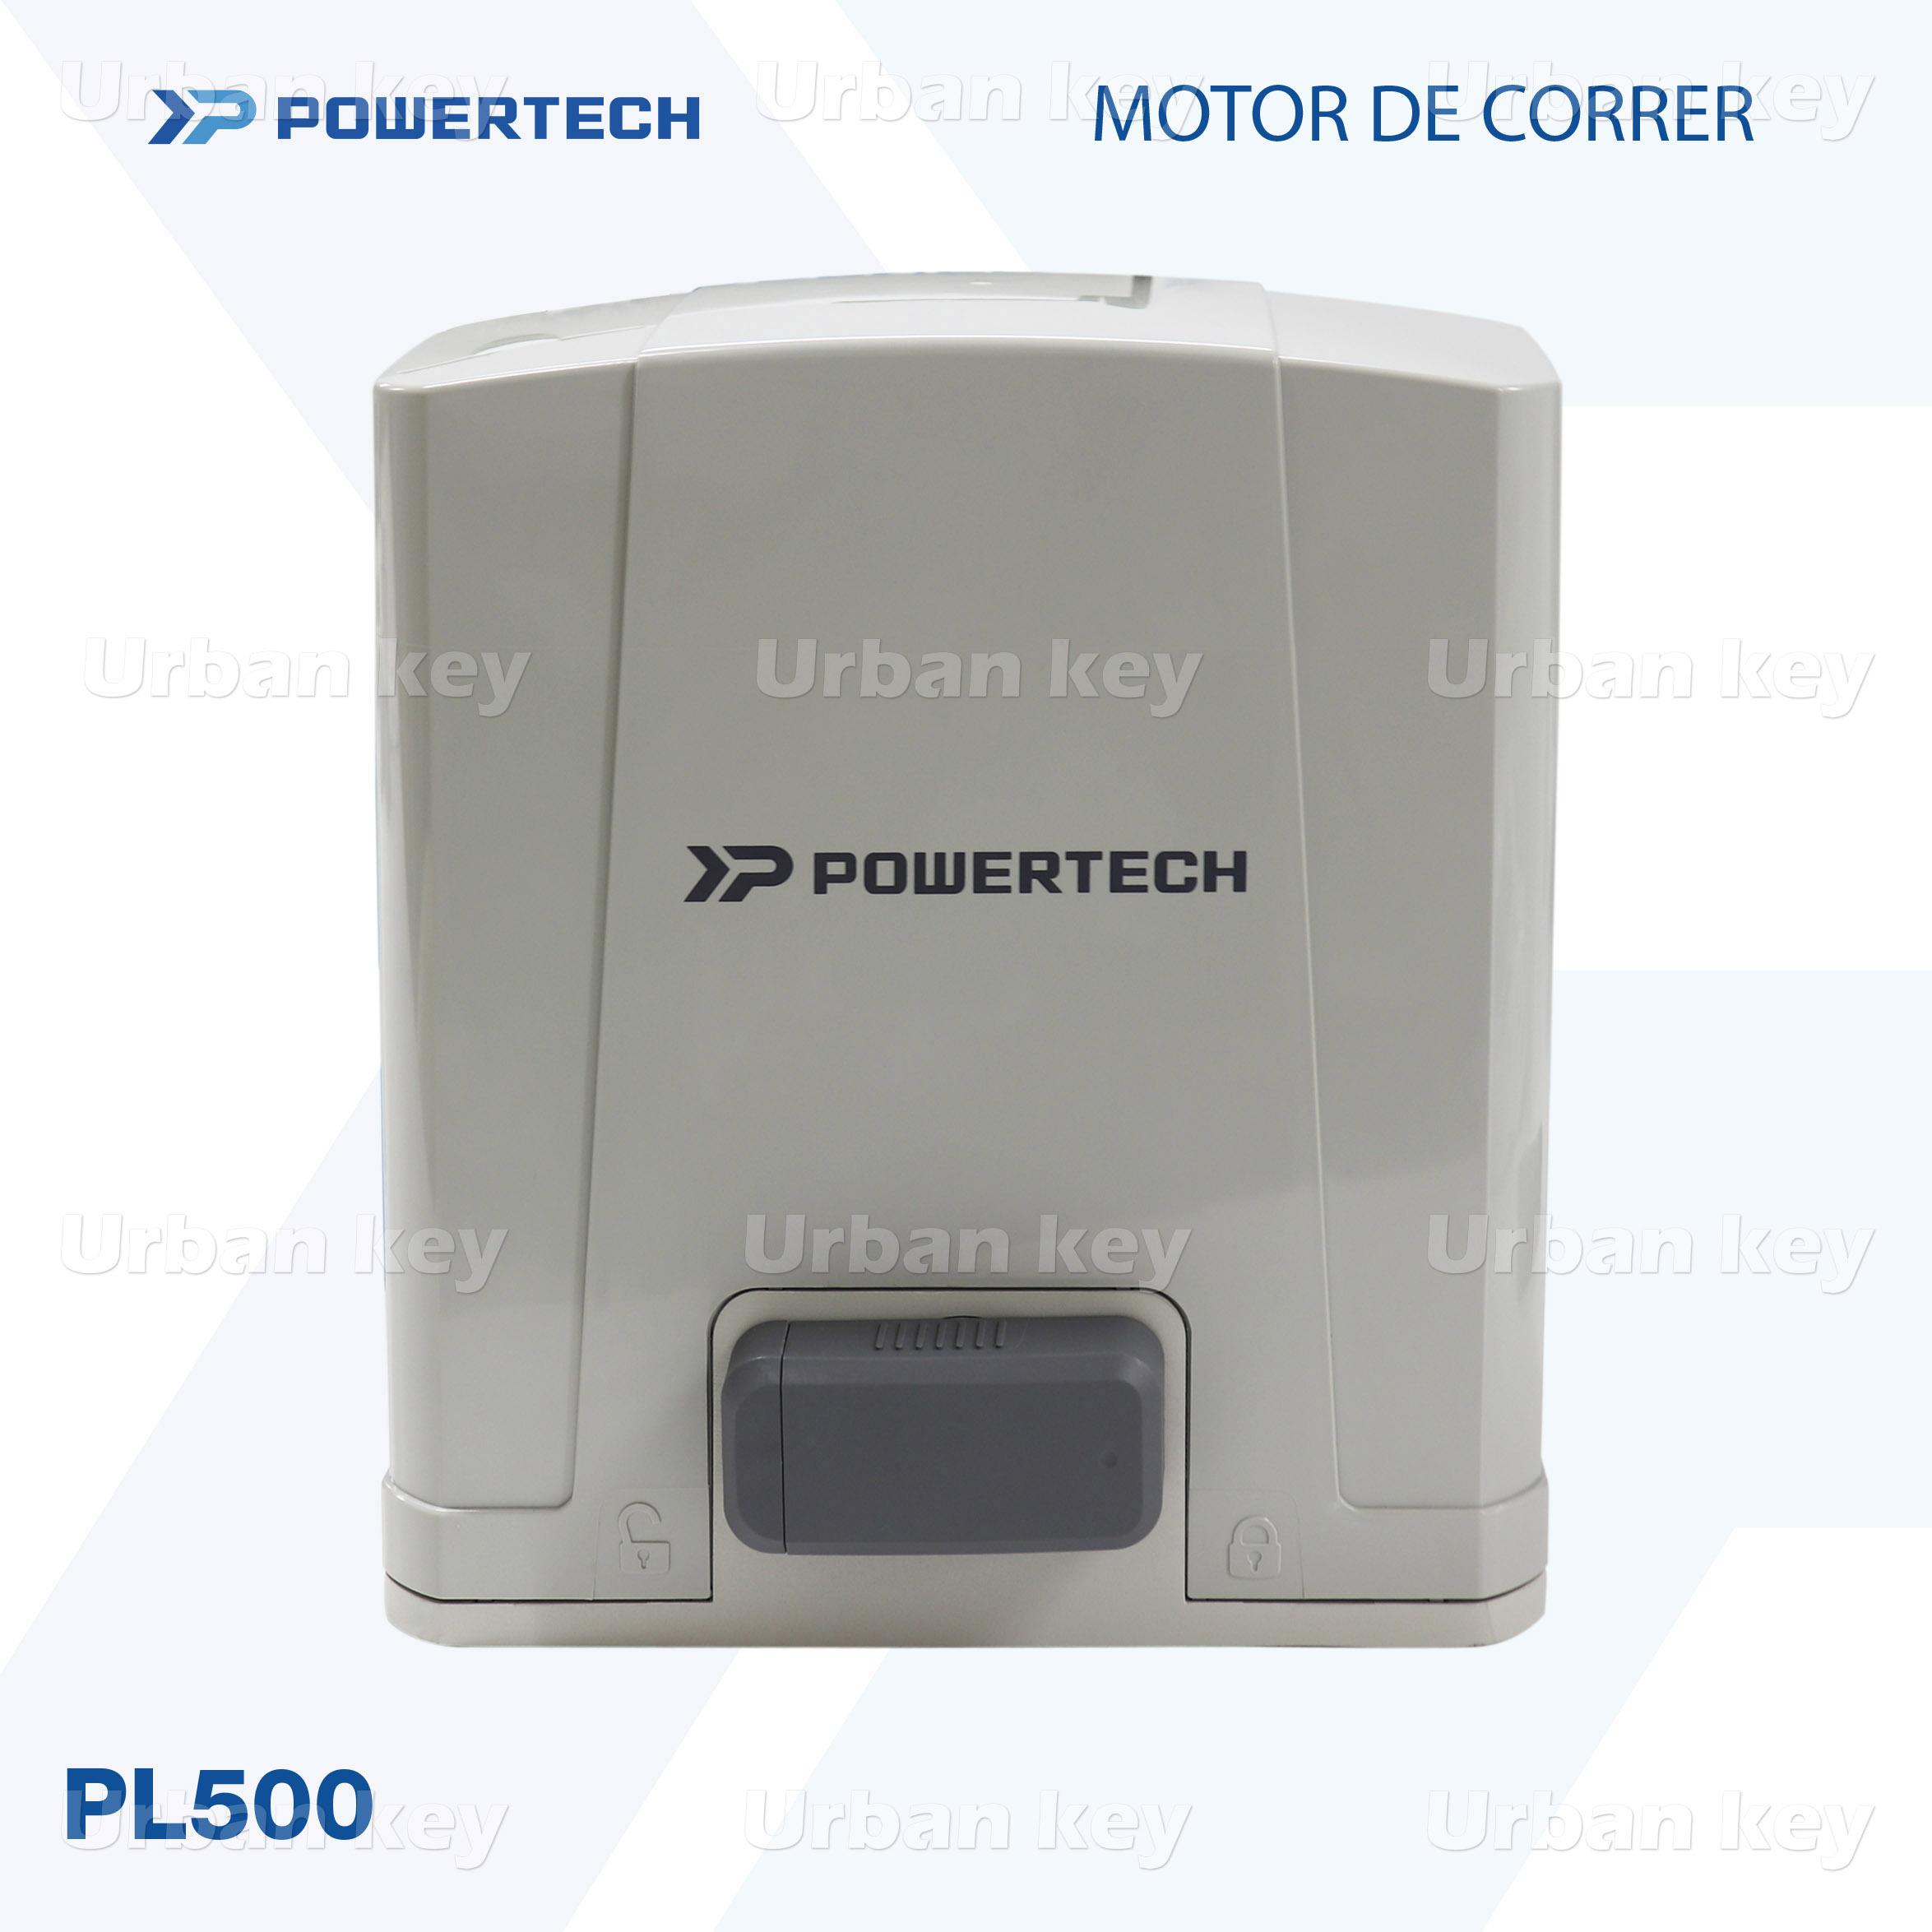 MOTOR DE CORRER PL500_DC POWERTECH